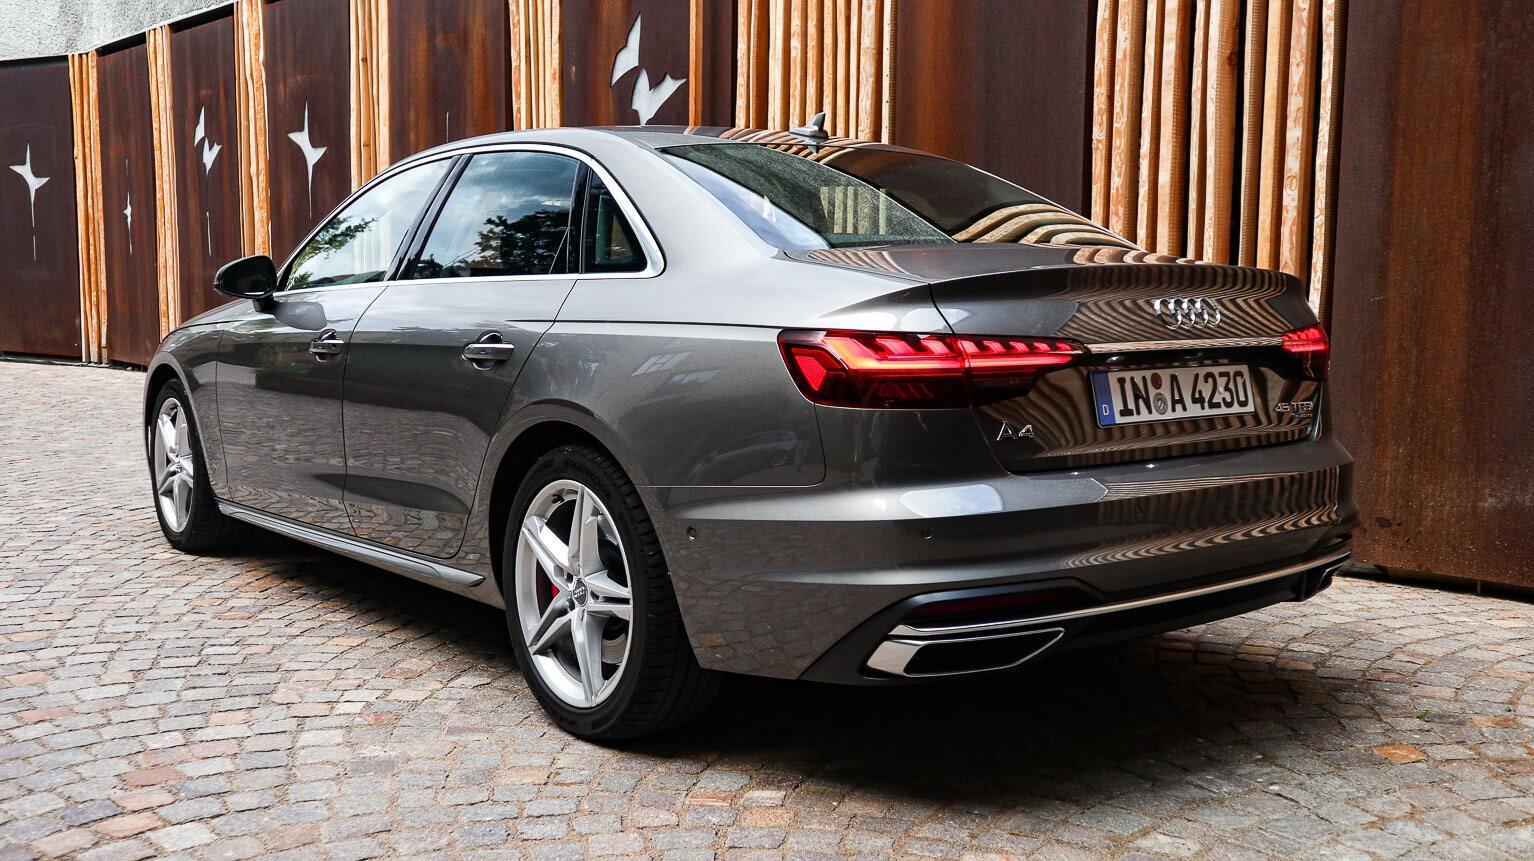 Audi A4 45 TFSI quattro 2020 review